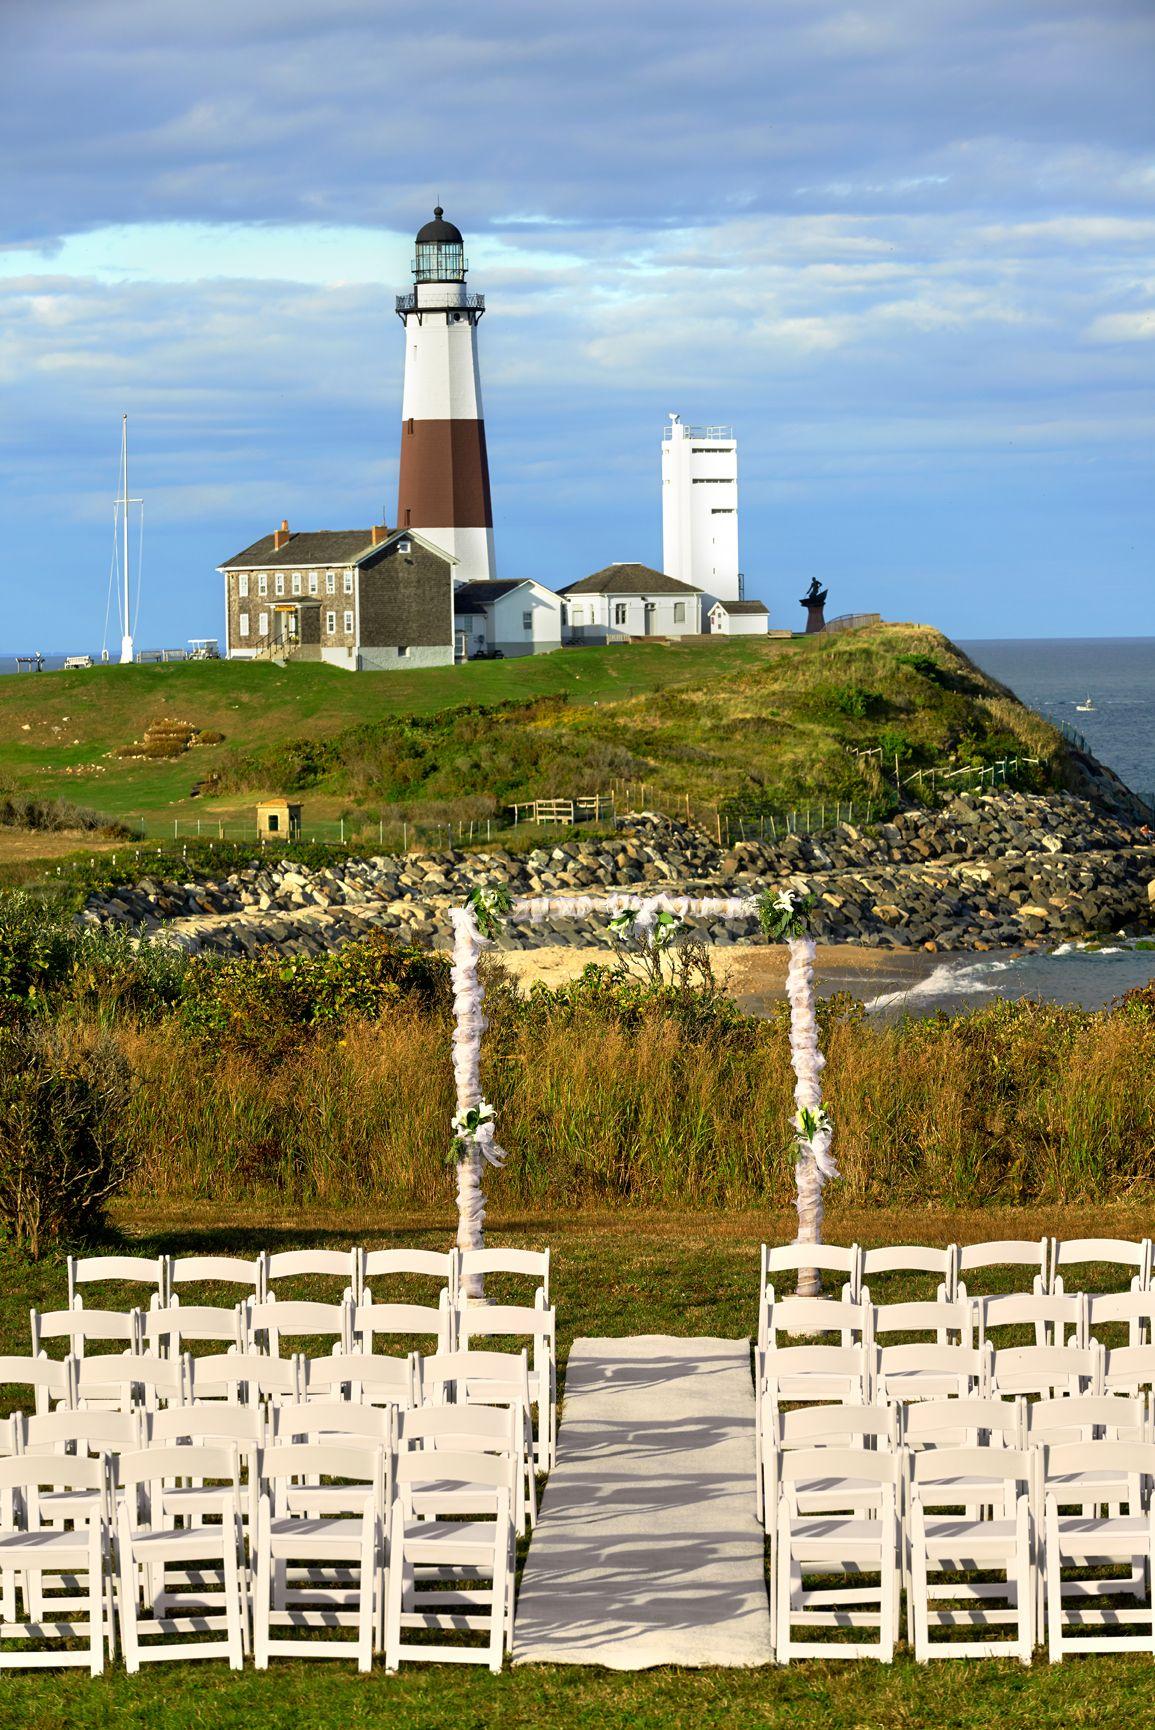 360 East Montauk wedding ceremony site Hamptons wedding